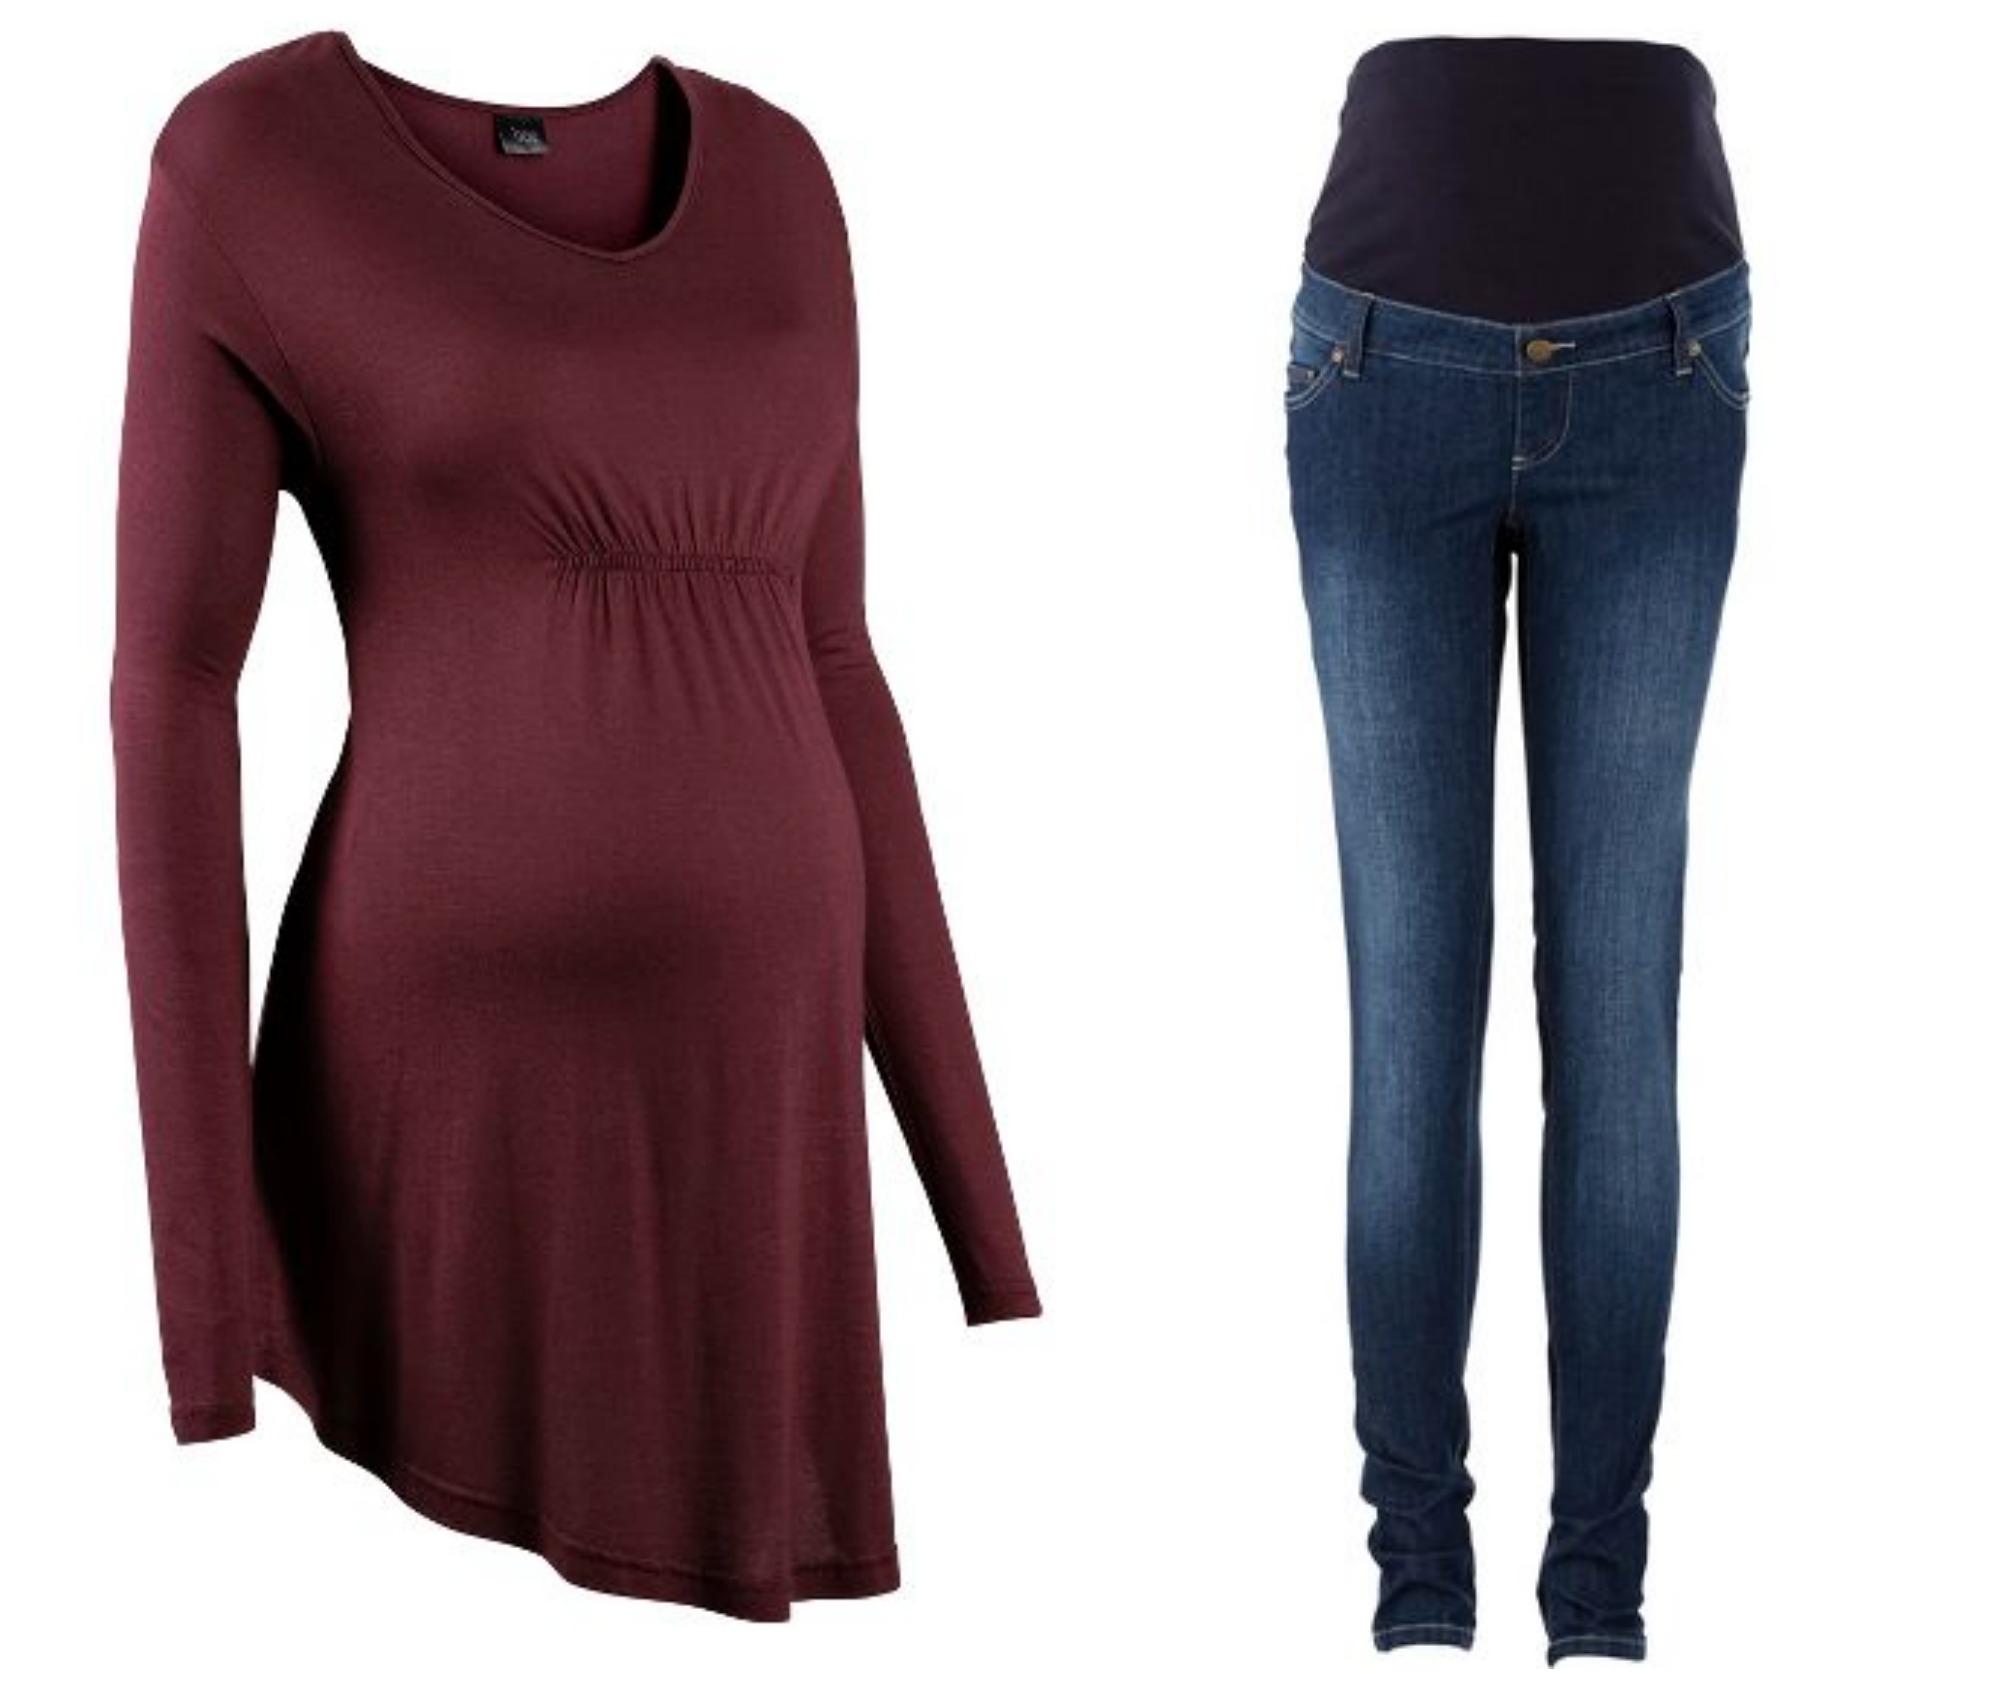 bonprix maternity outfit